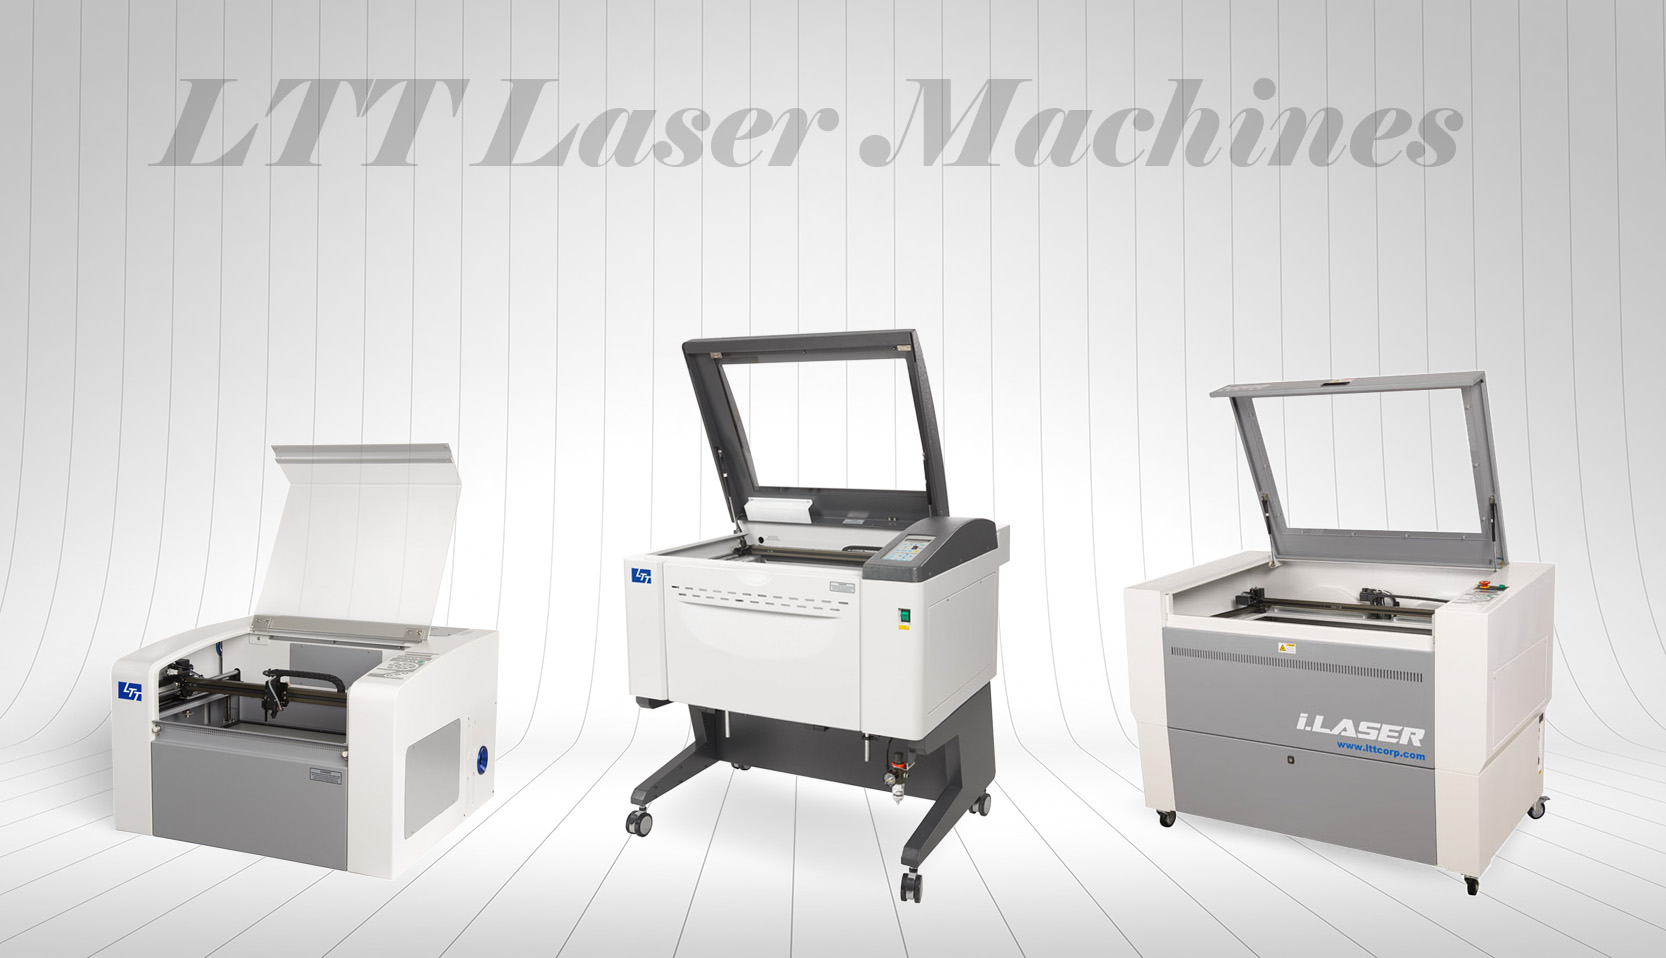 LASER ENGRAVING MACHINES FROM ltt